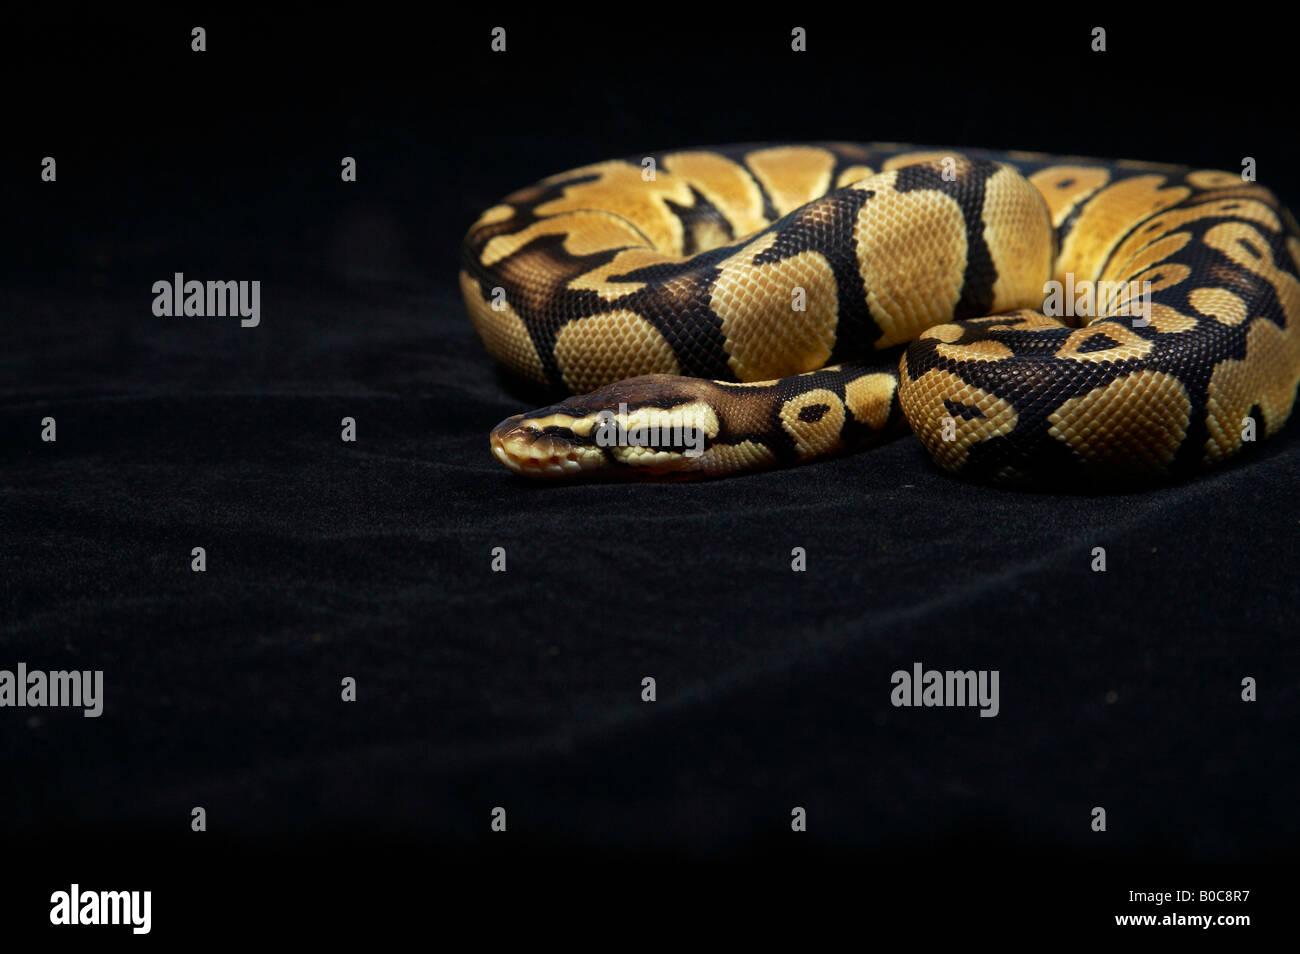 Royal Python Coiled On The Floor